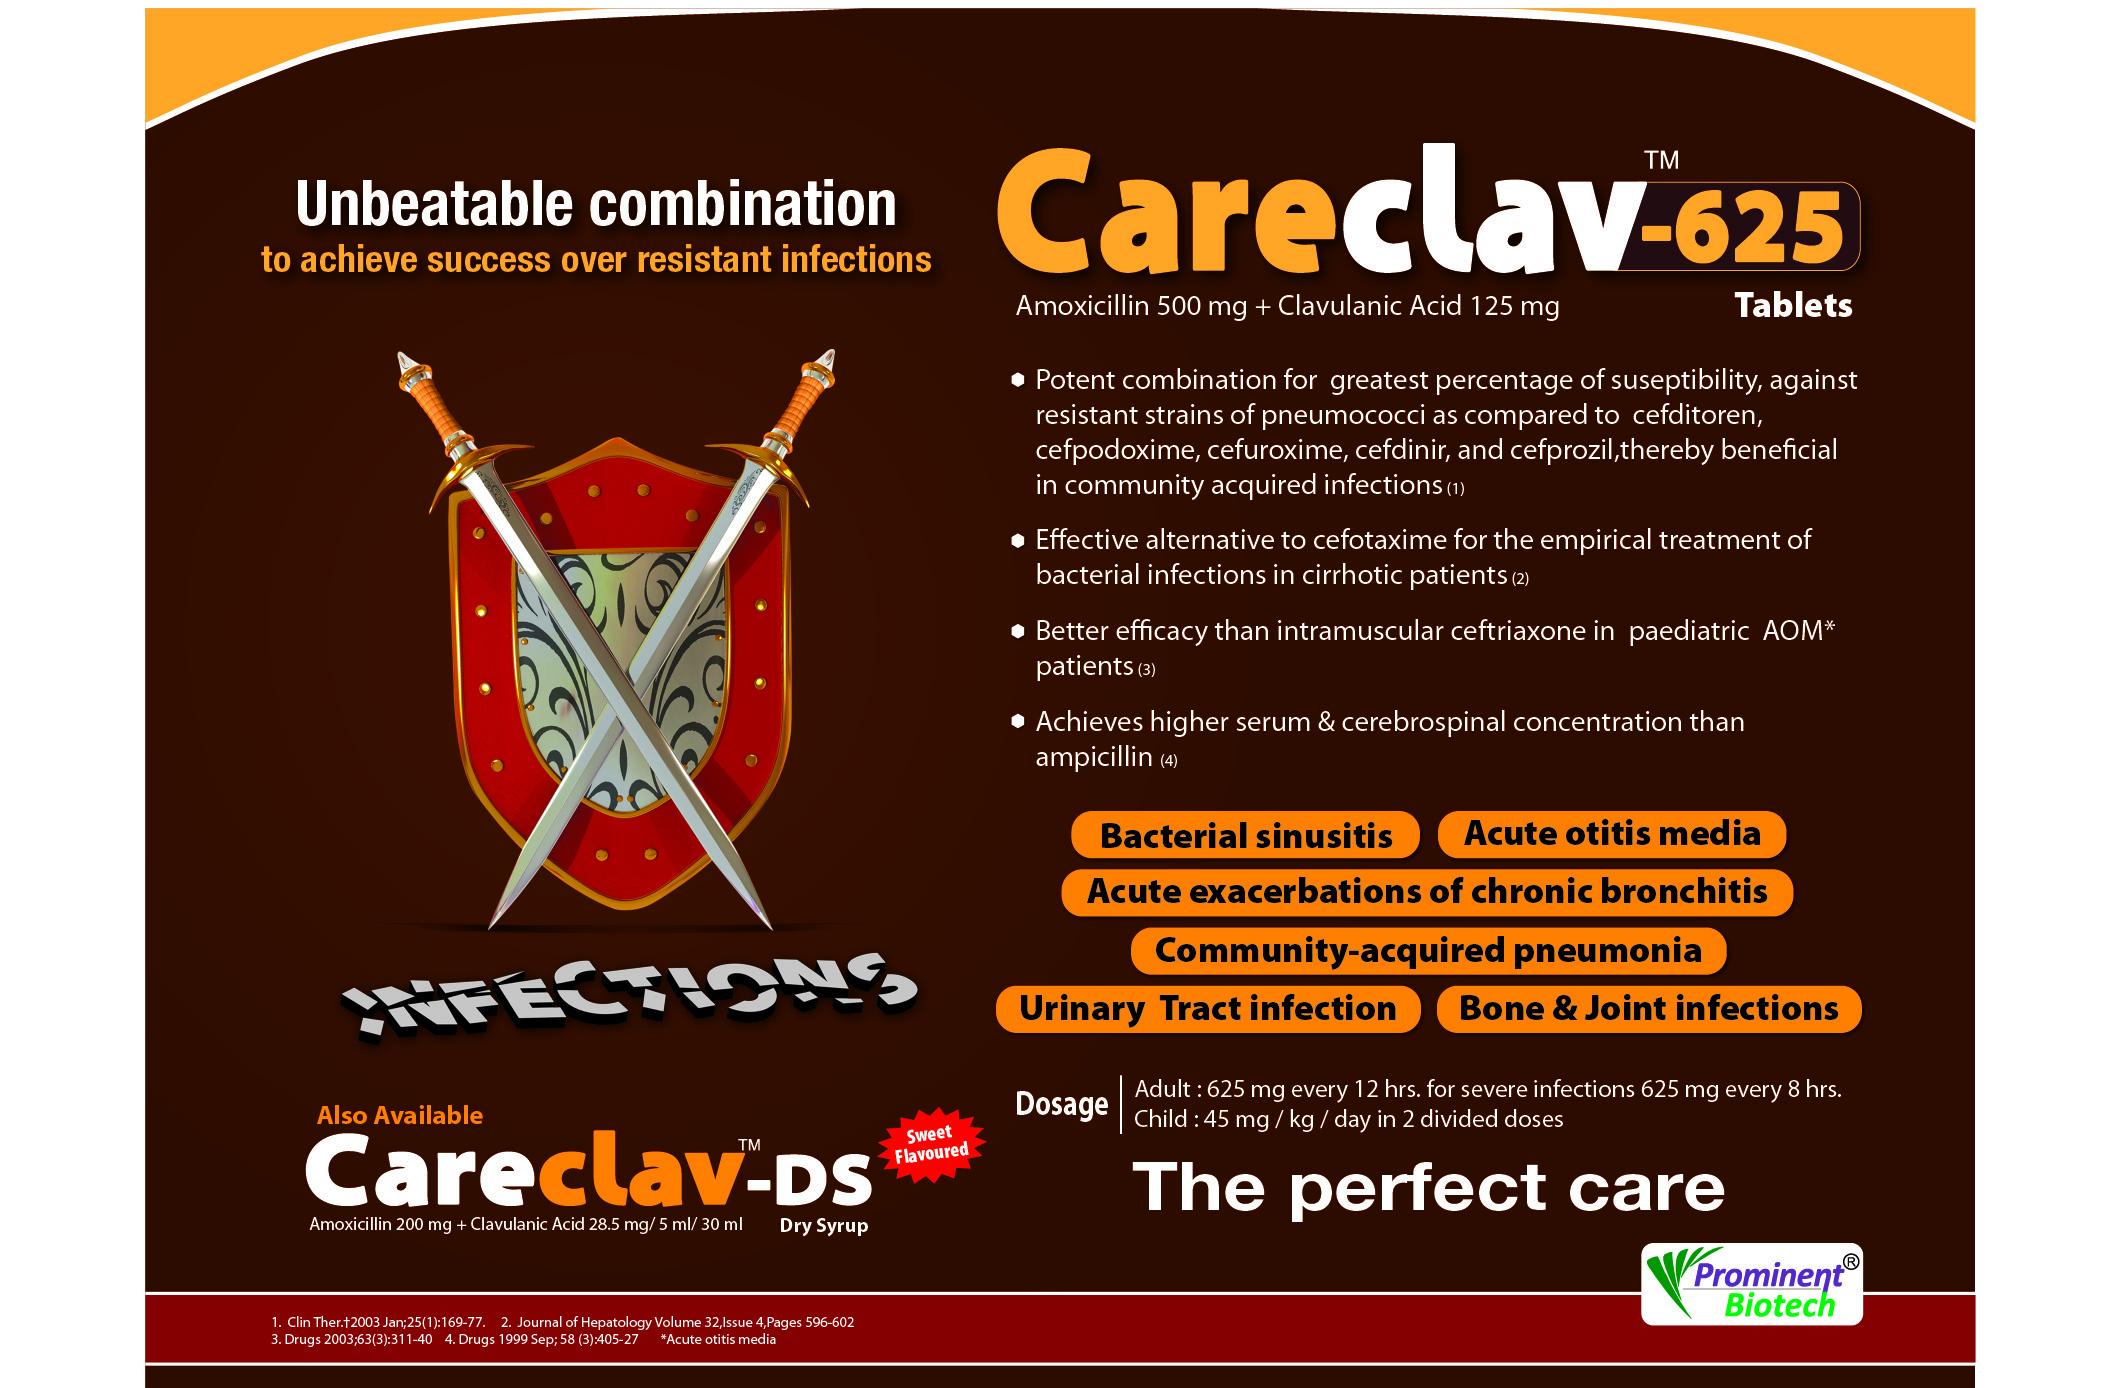 Amoxycillin 400 Mg & Clavulanic Acid 57.5 Mg Per 5 Ml